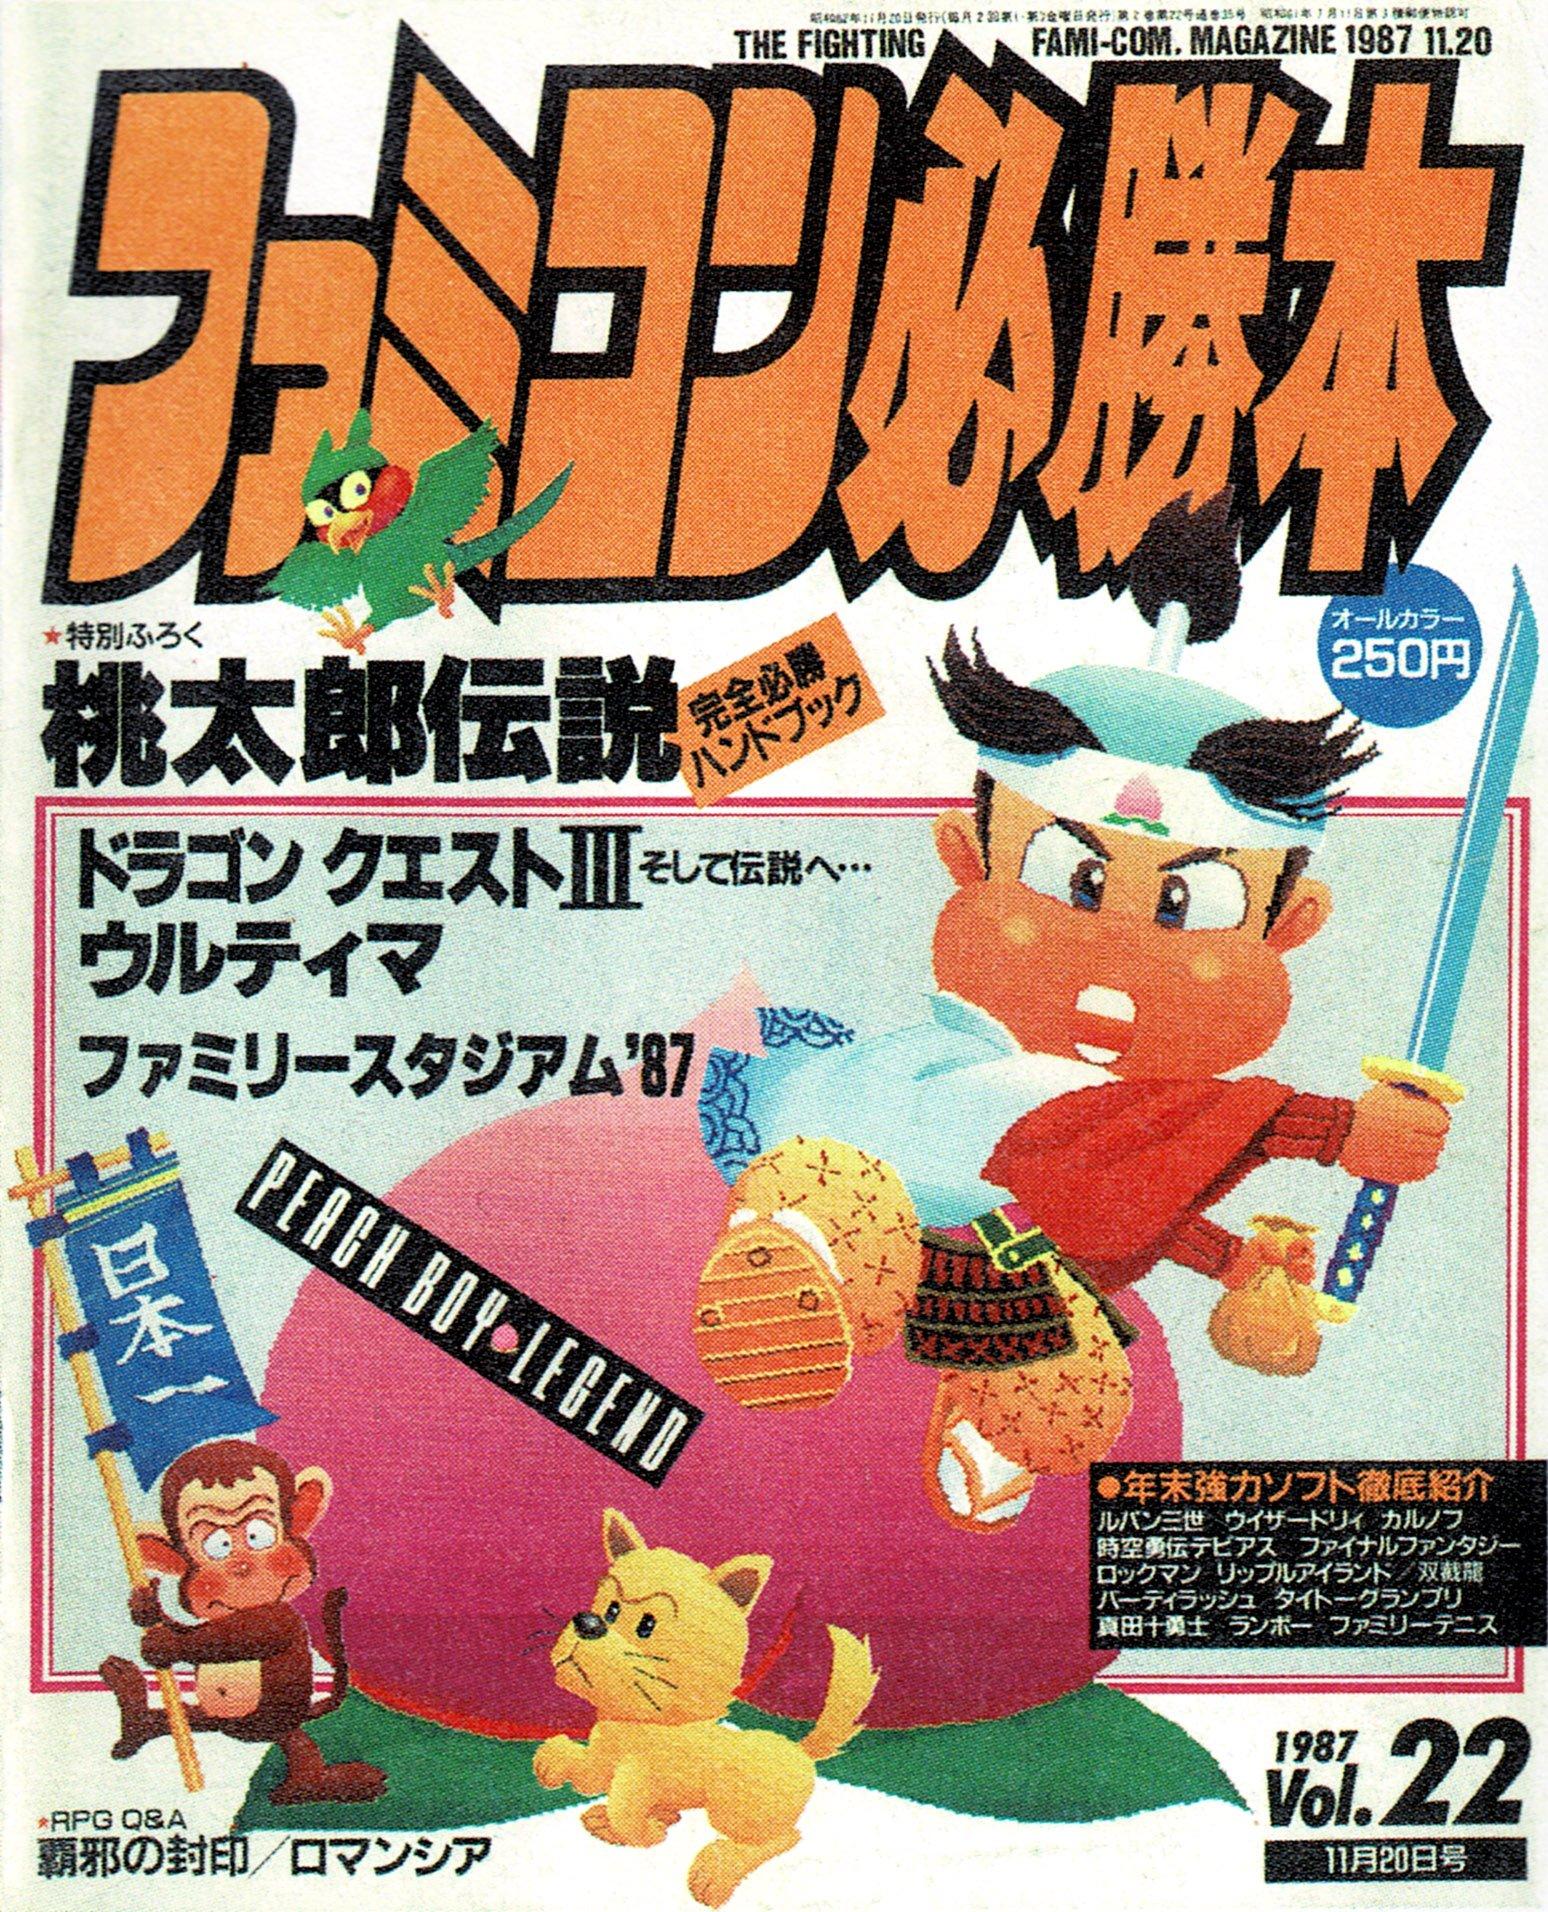 Famicom Hisshoubon Issue 035 (November 20, 1987)